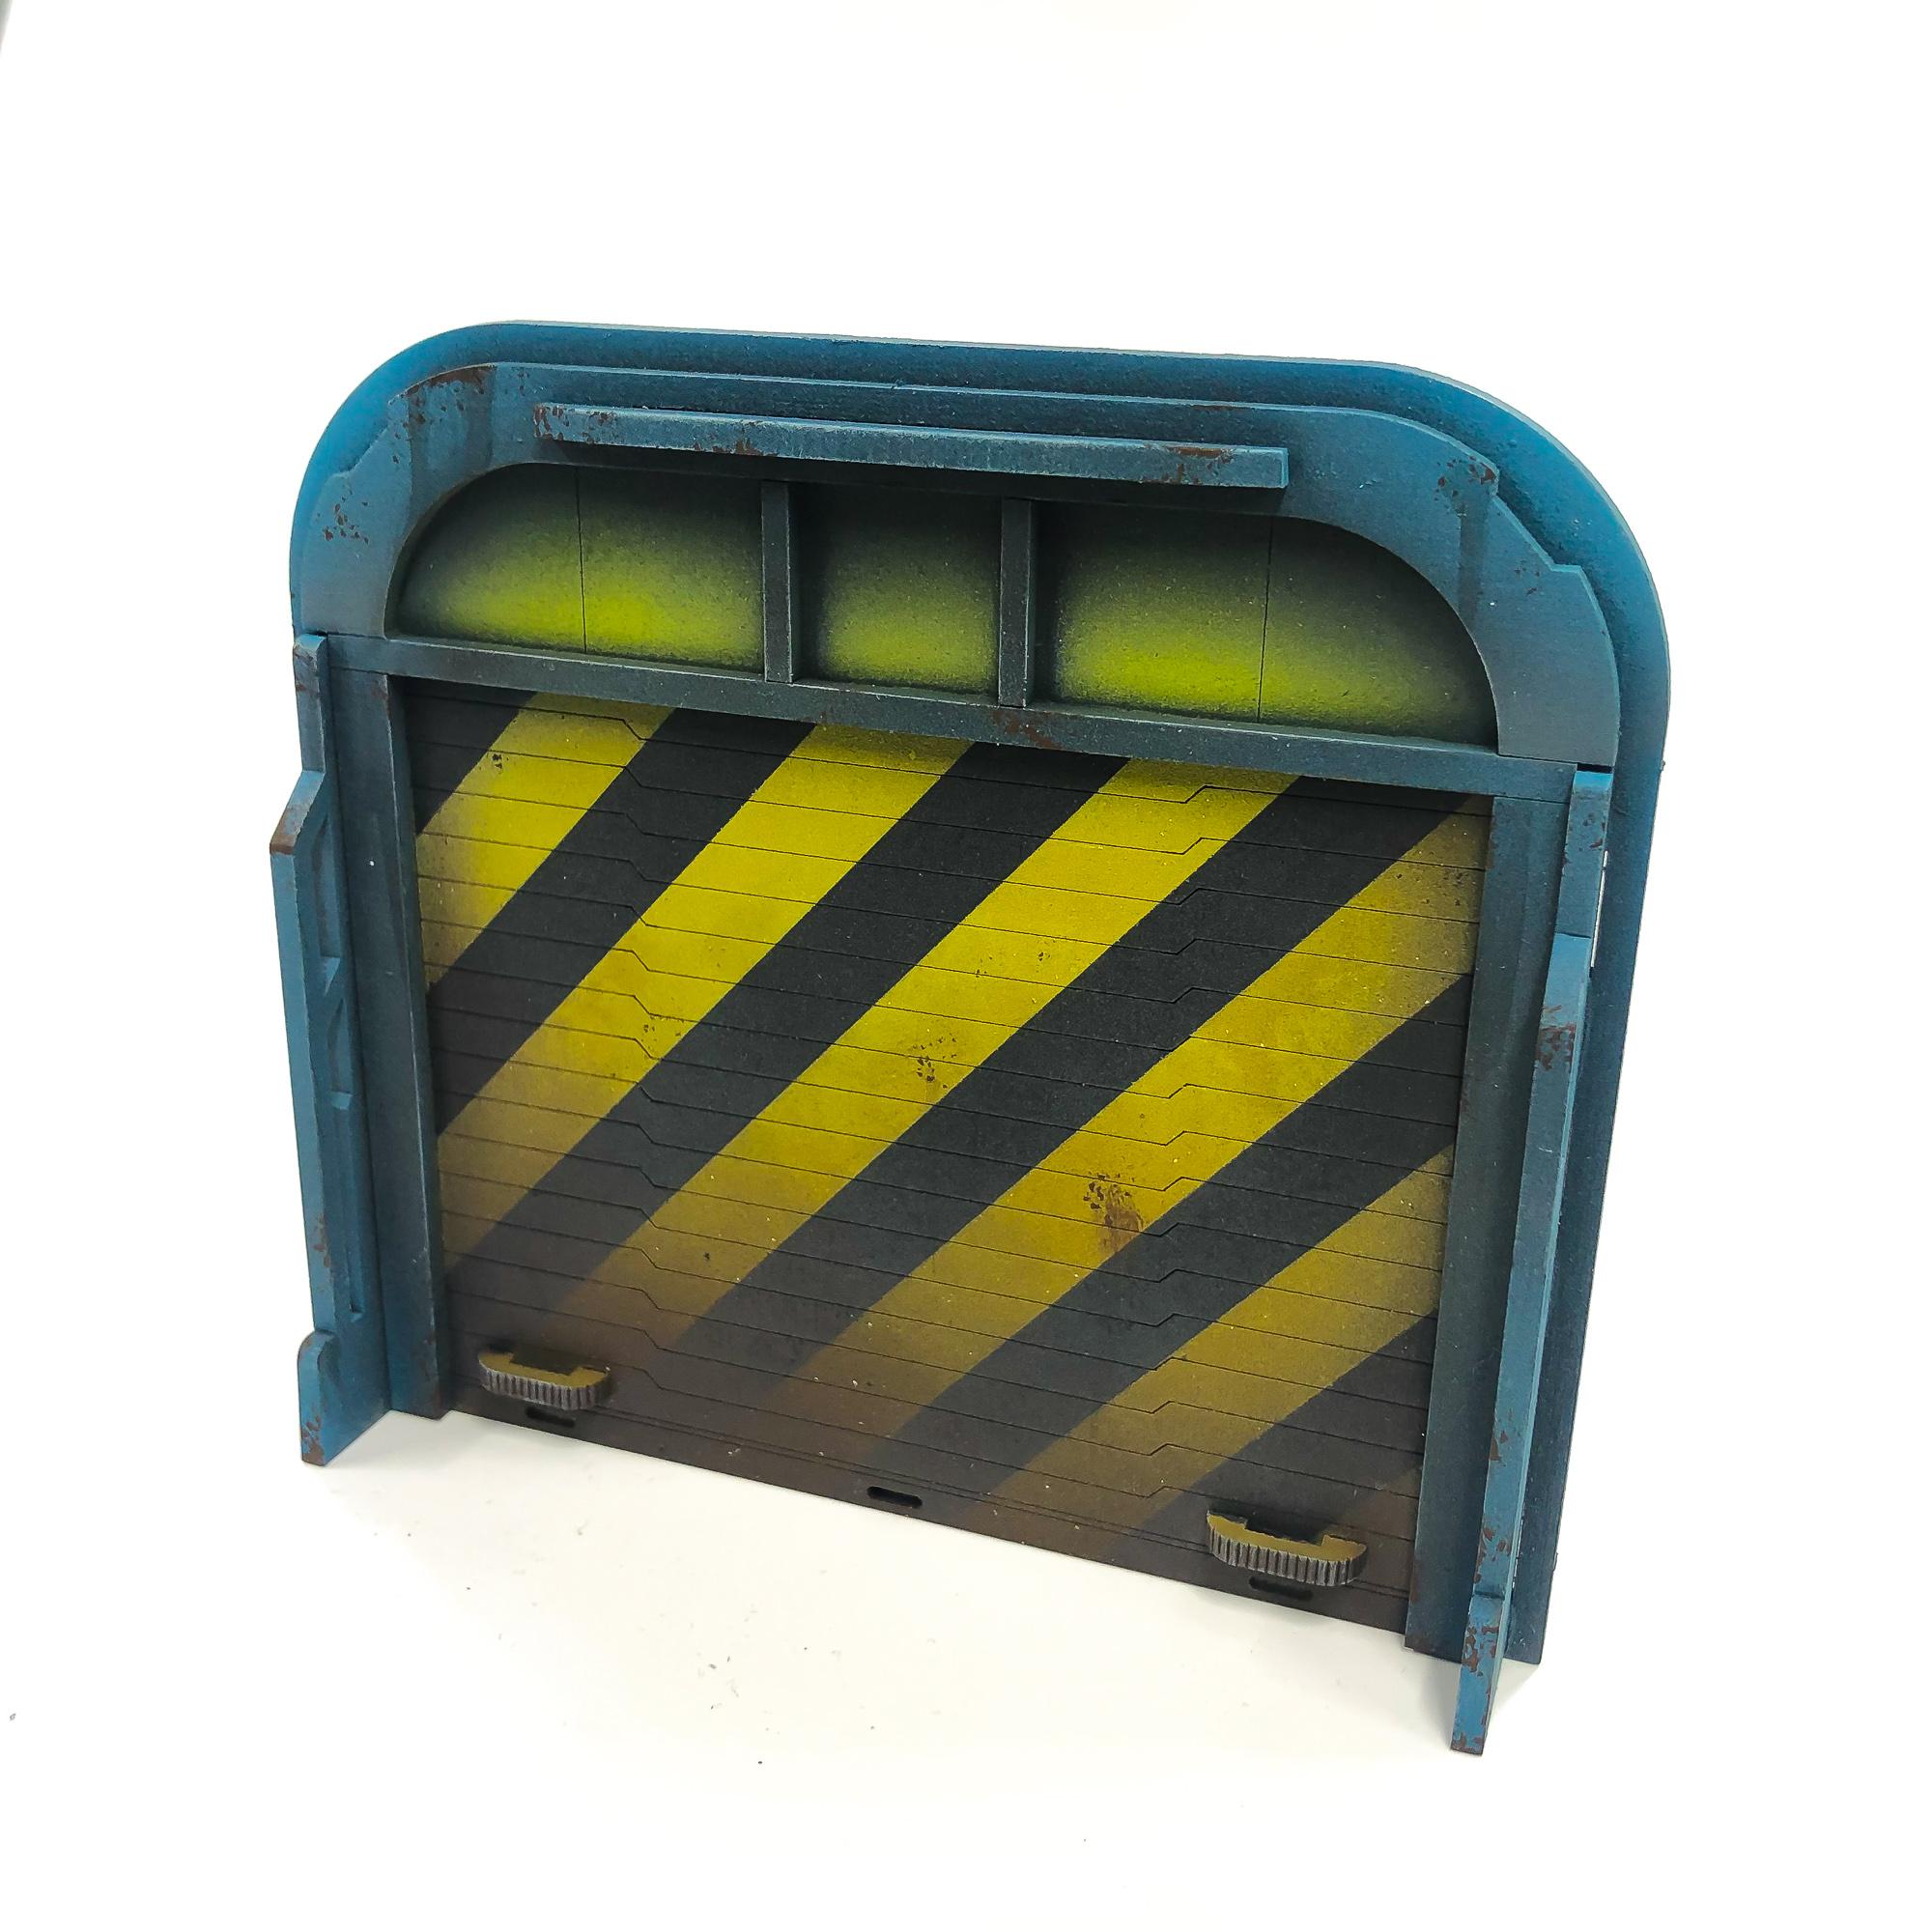 Garage Door Augment Death Ray Designs Tabletop